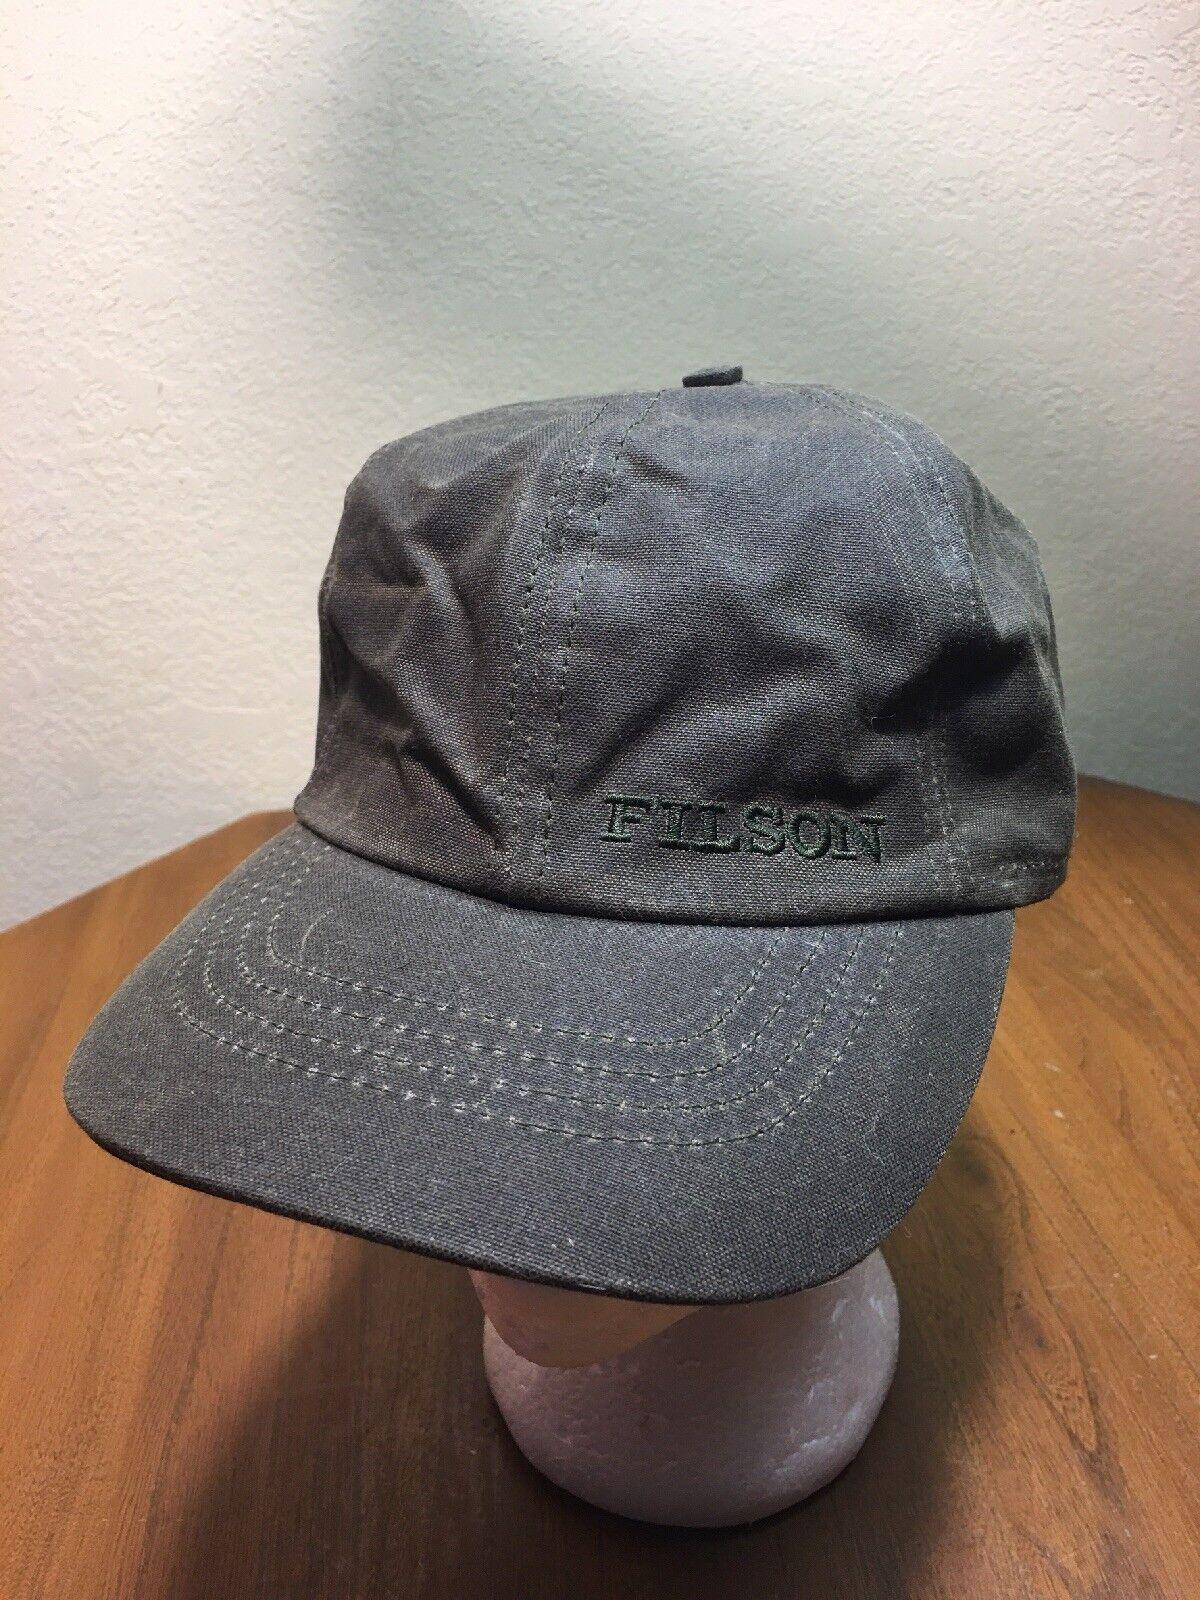 CC CC CC Filson Oiled Tin Cloth Insulated Sz S Otter Green Cap Hat Tuck Away Ear Flaps d31563